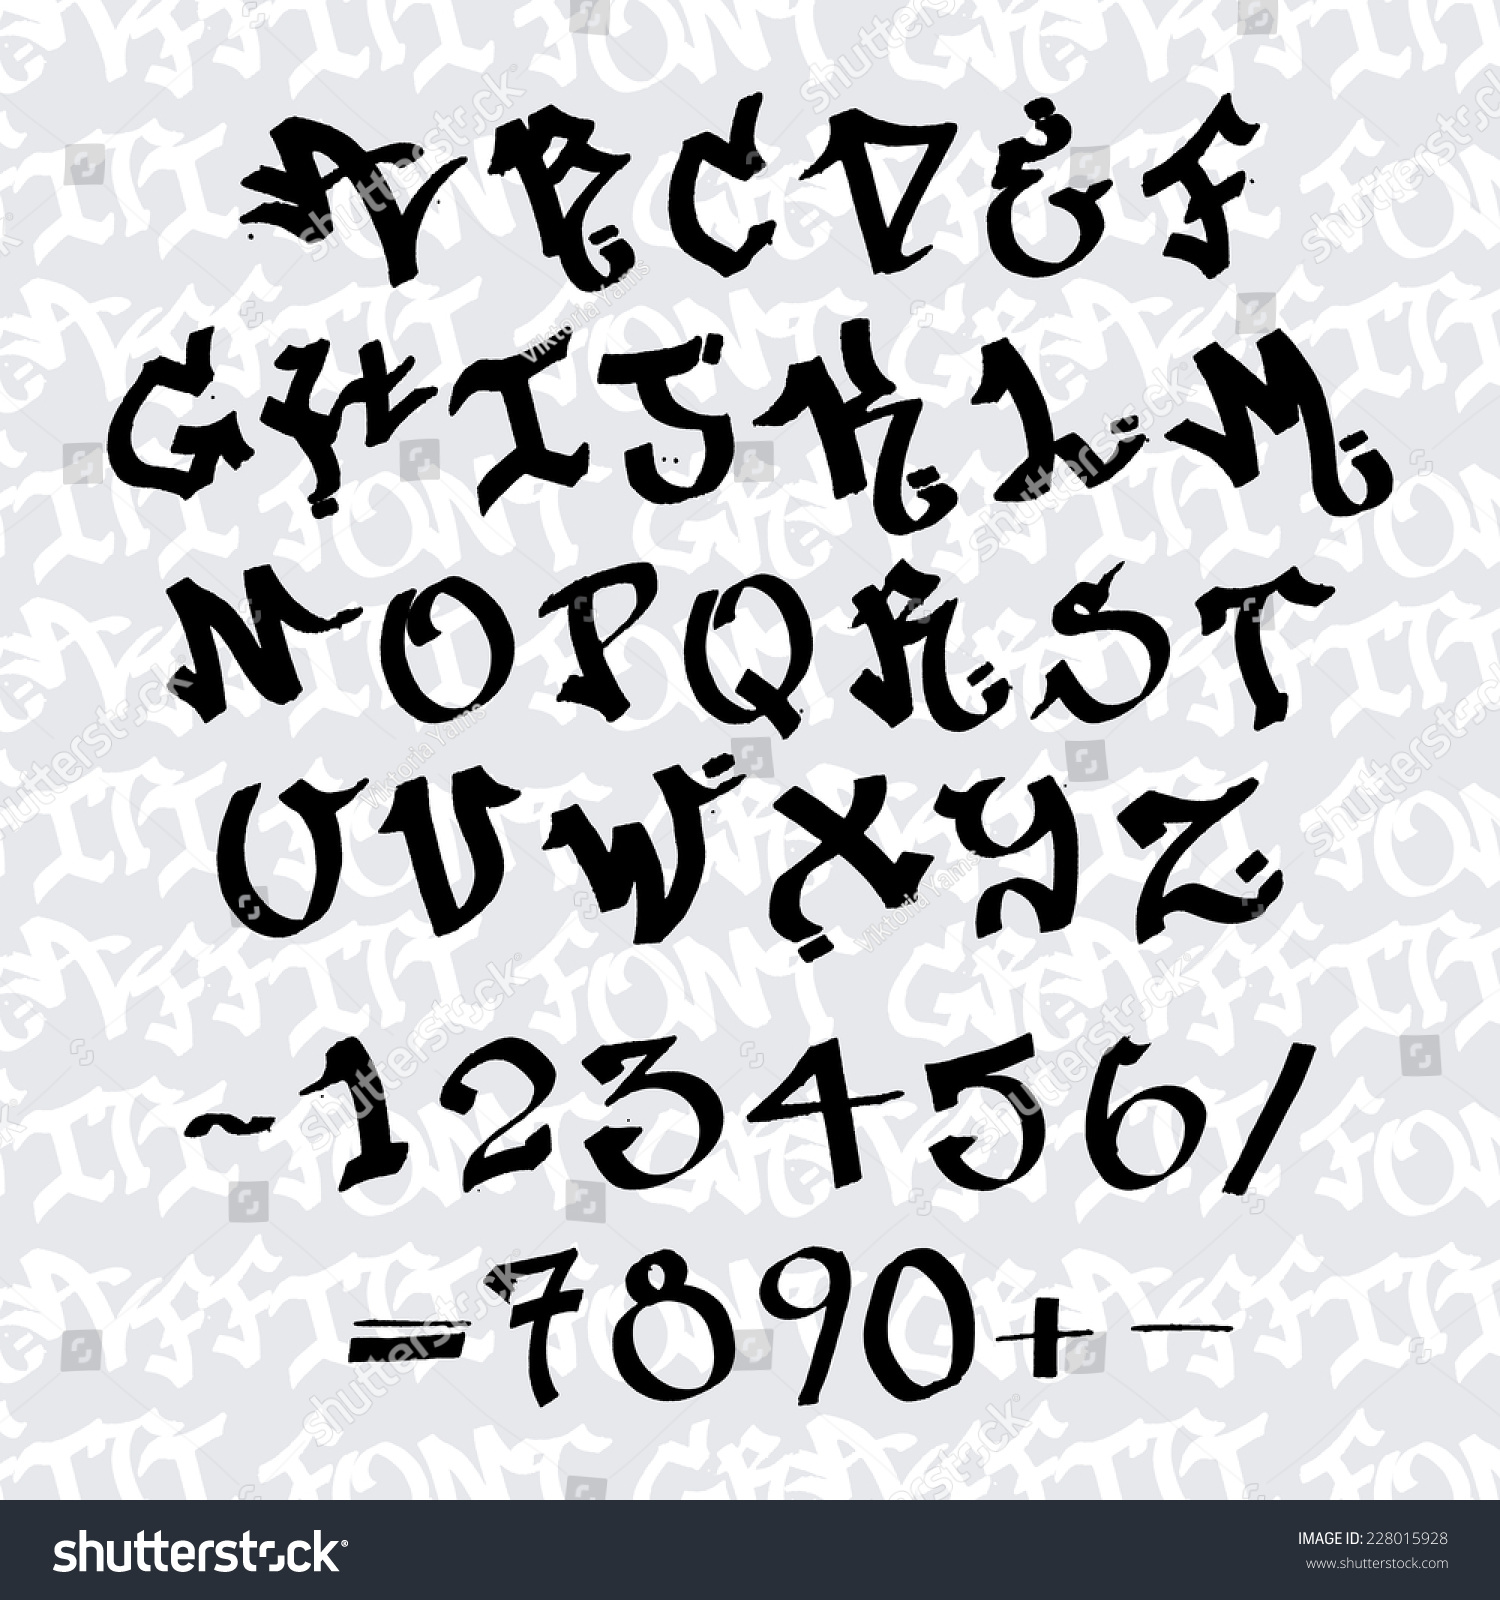 Ink graffiti handwritten tag letters alphabet vector